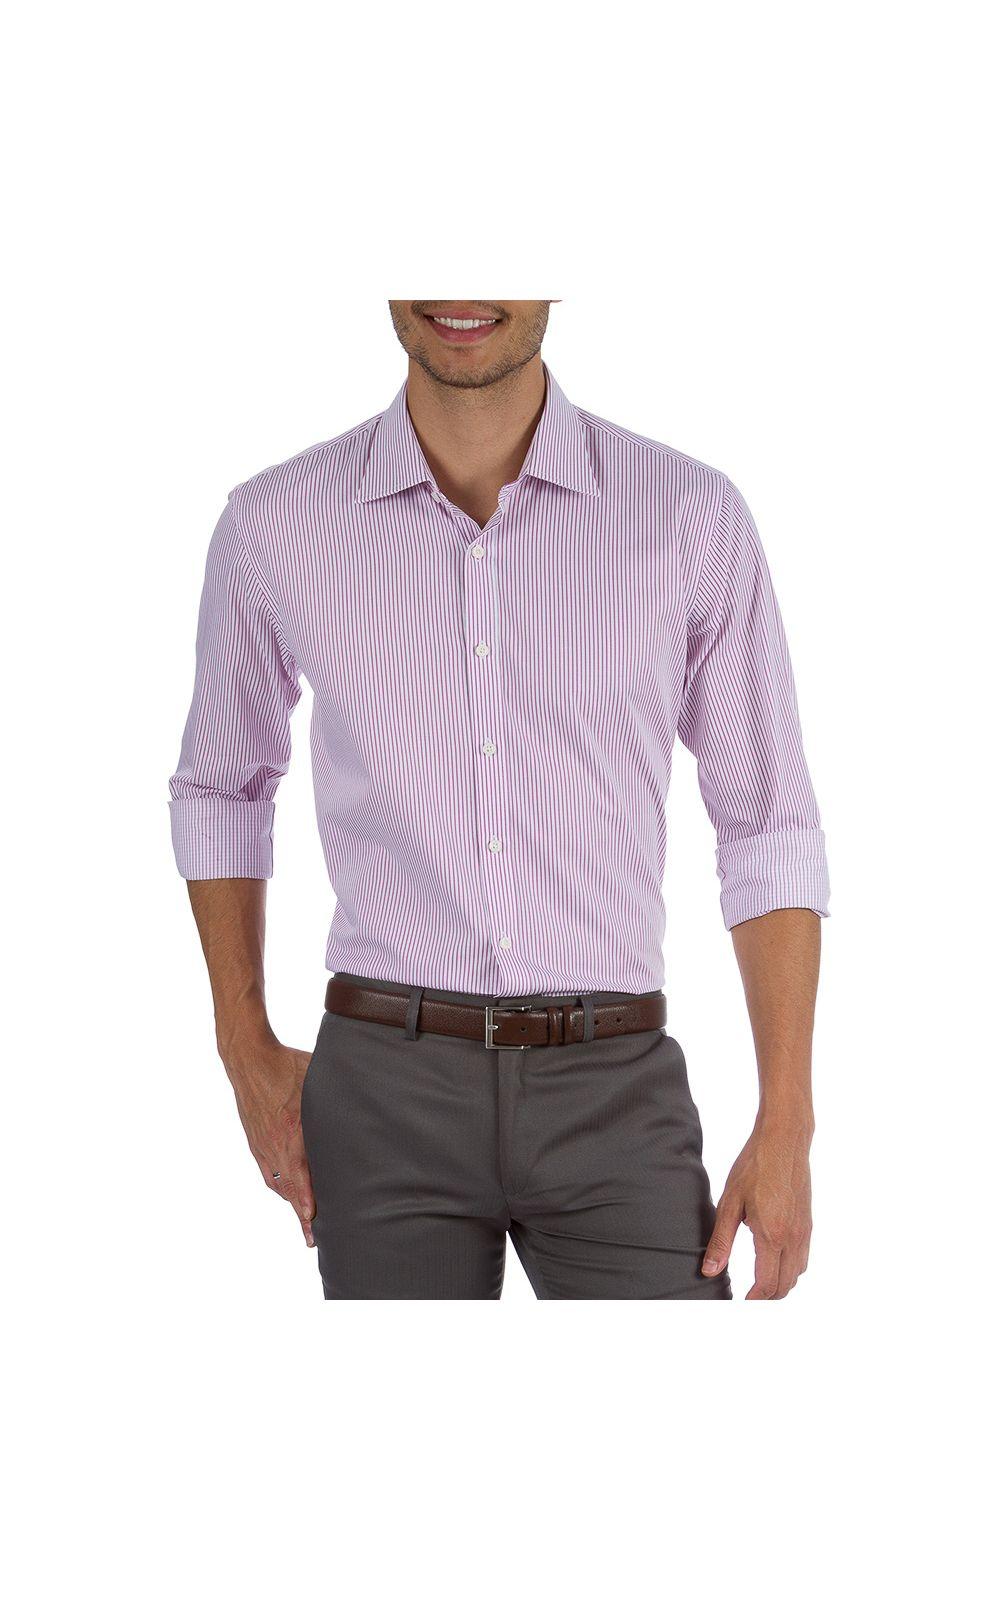 Foto 1 - Camisa Social Masculina Rosa Listrada